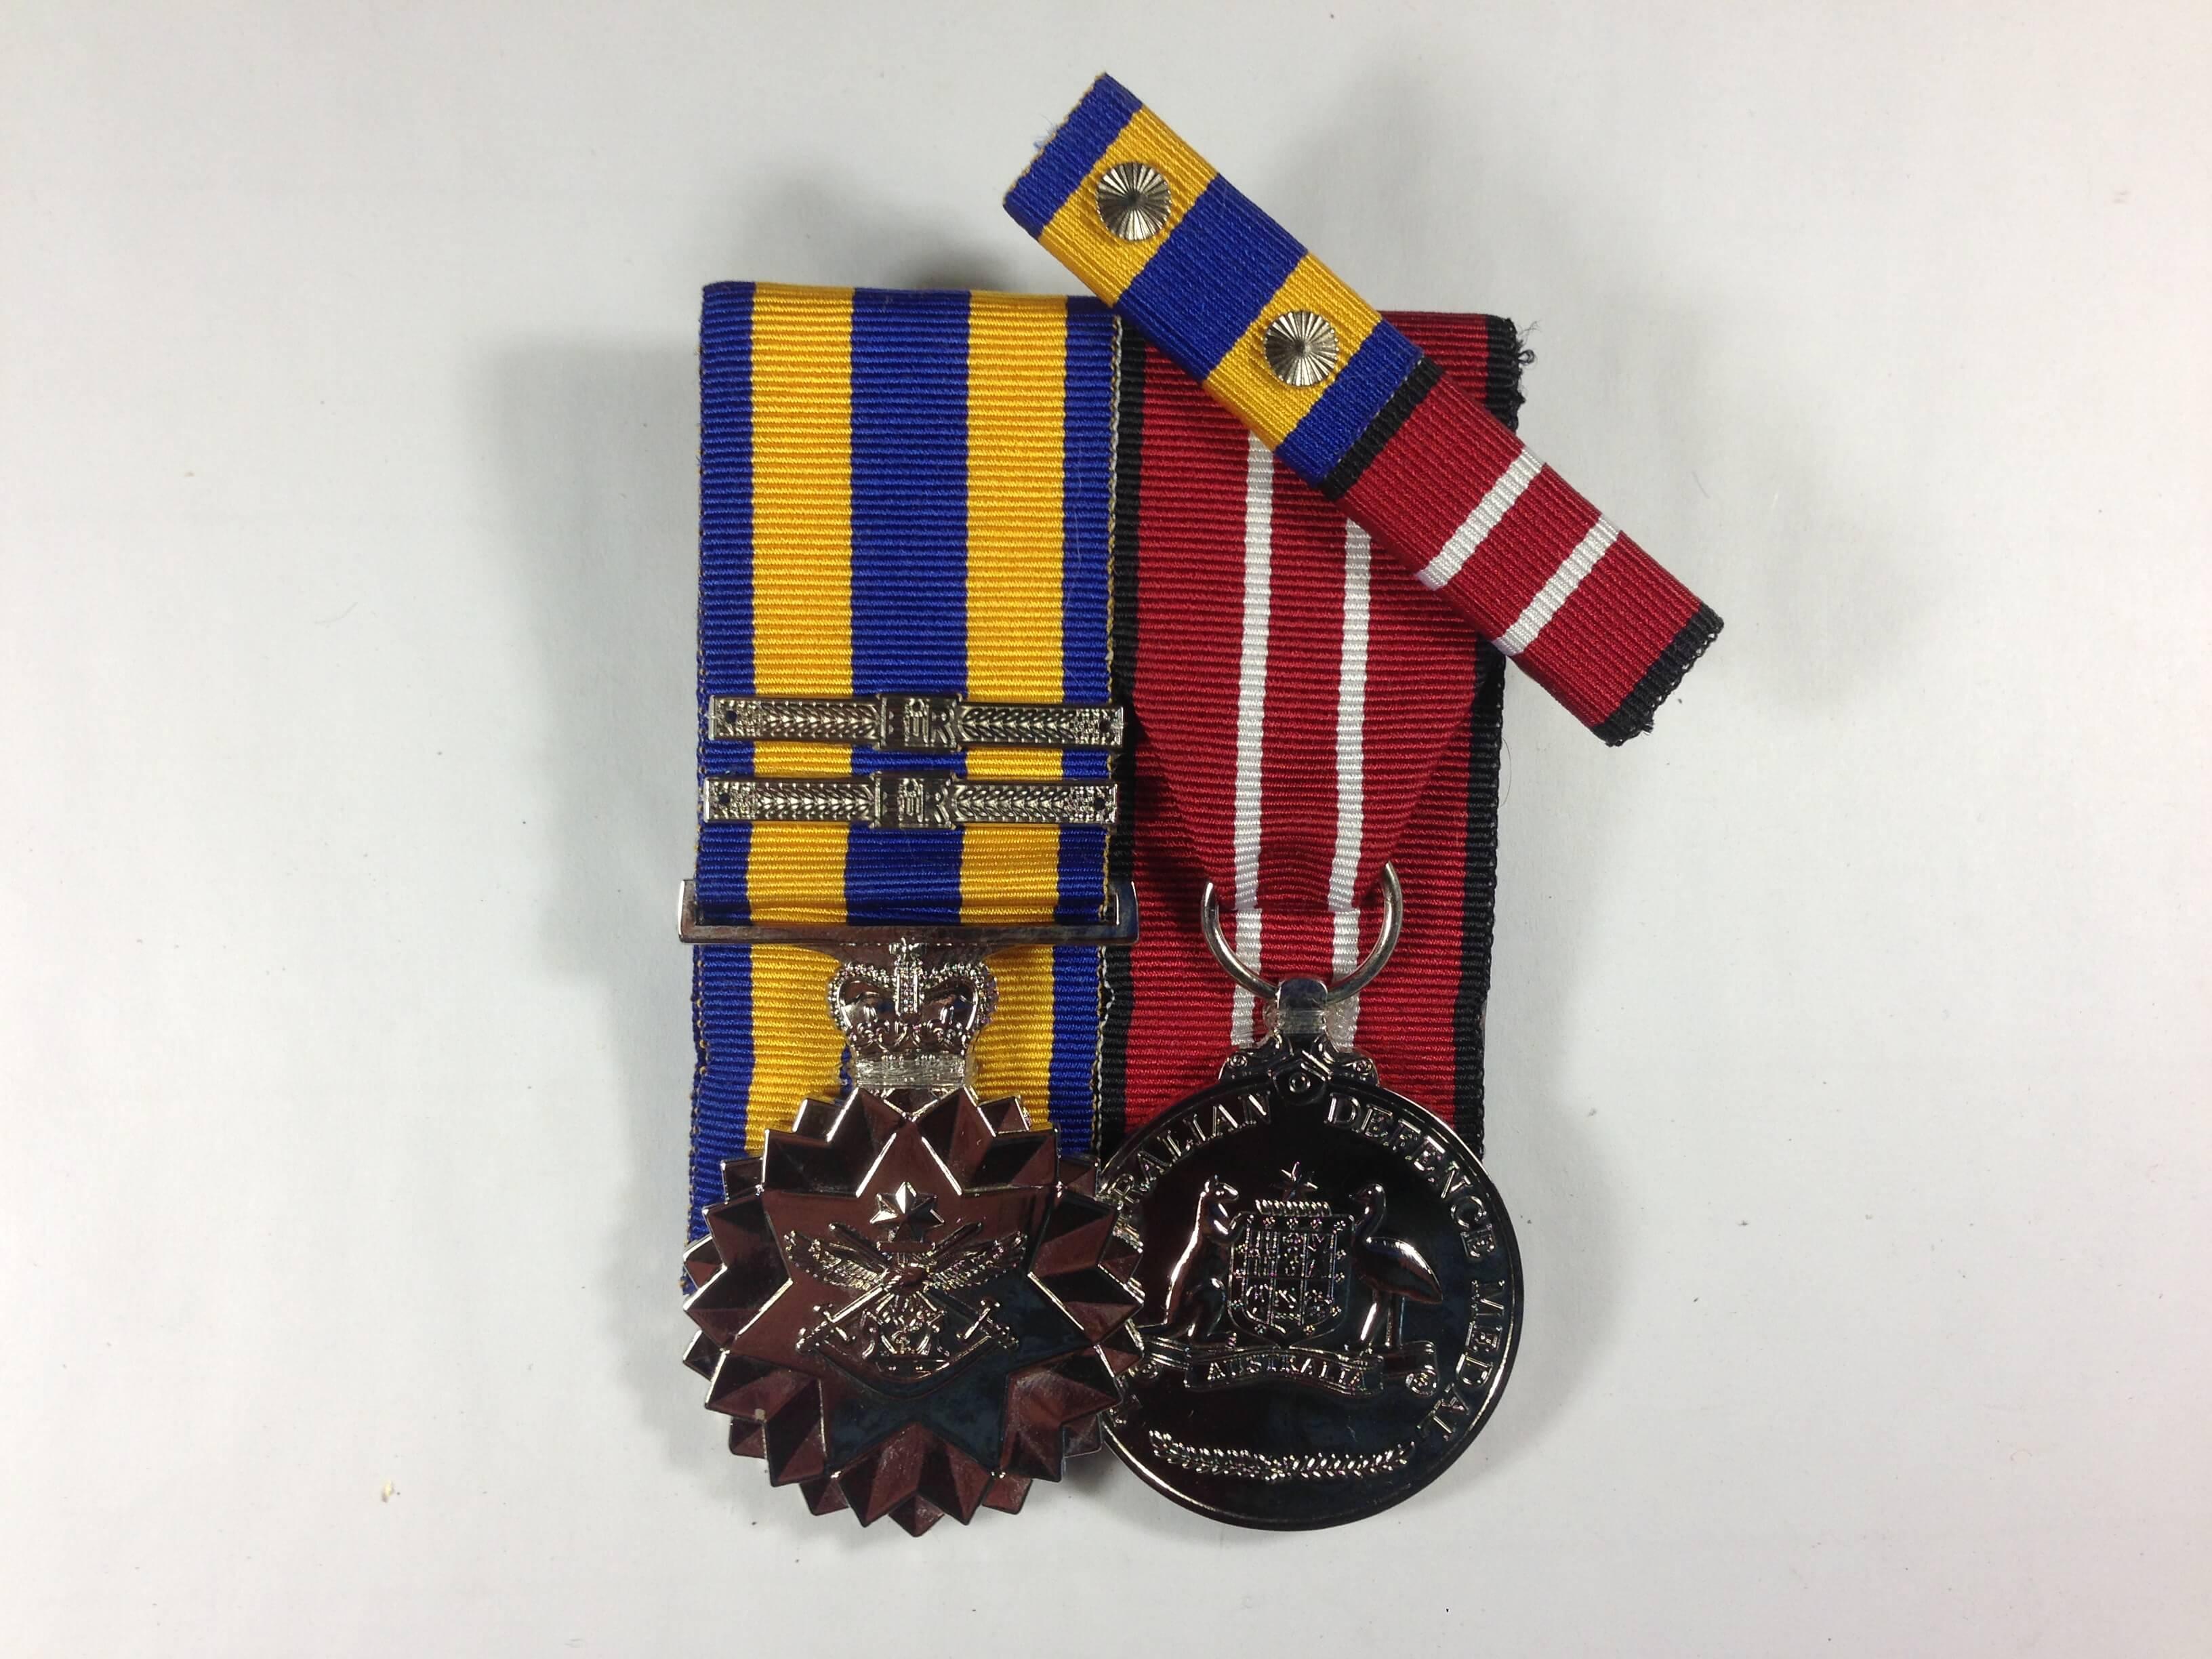 Defence Force Service Medal + 2 clasps Australian Defence Medal + Ribbon Bar